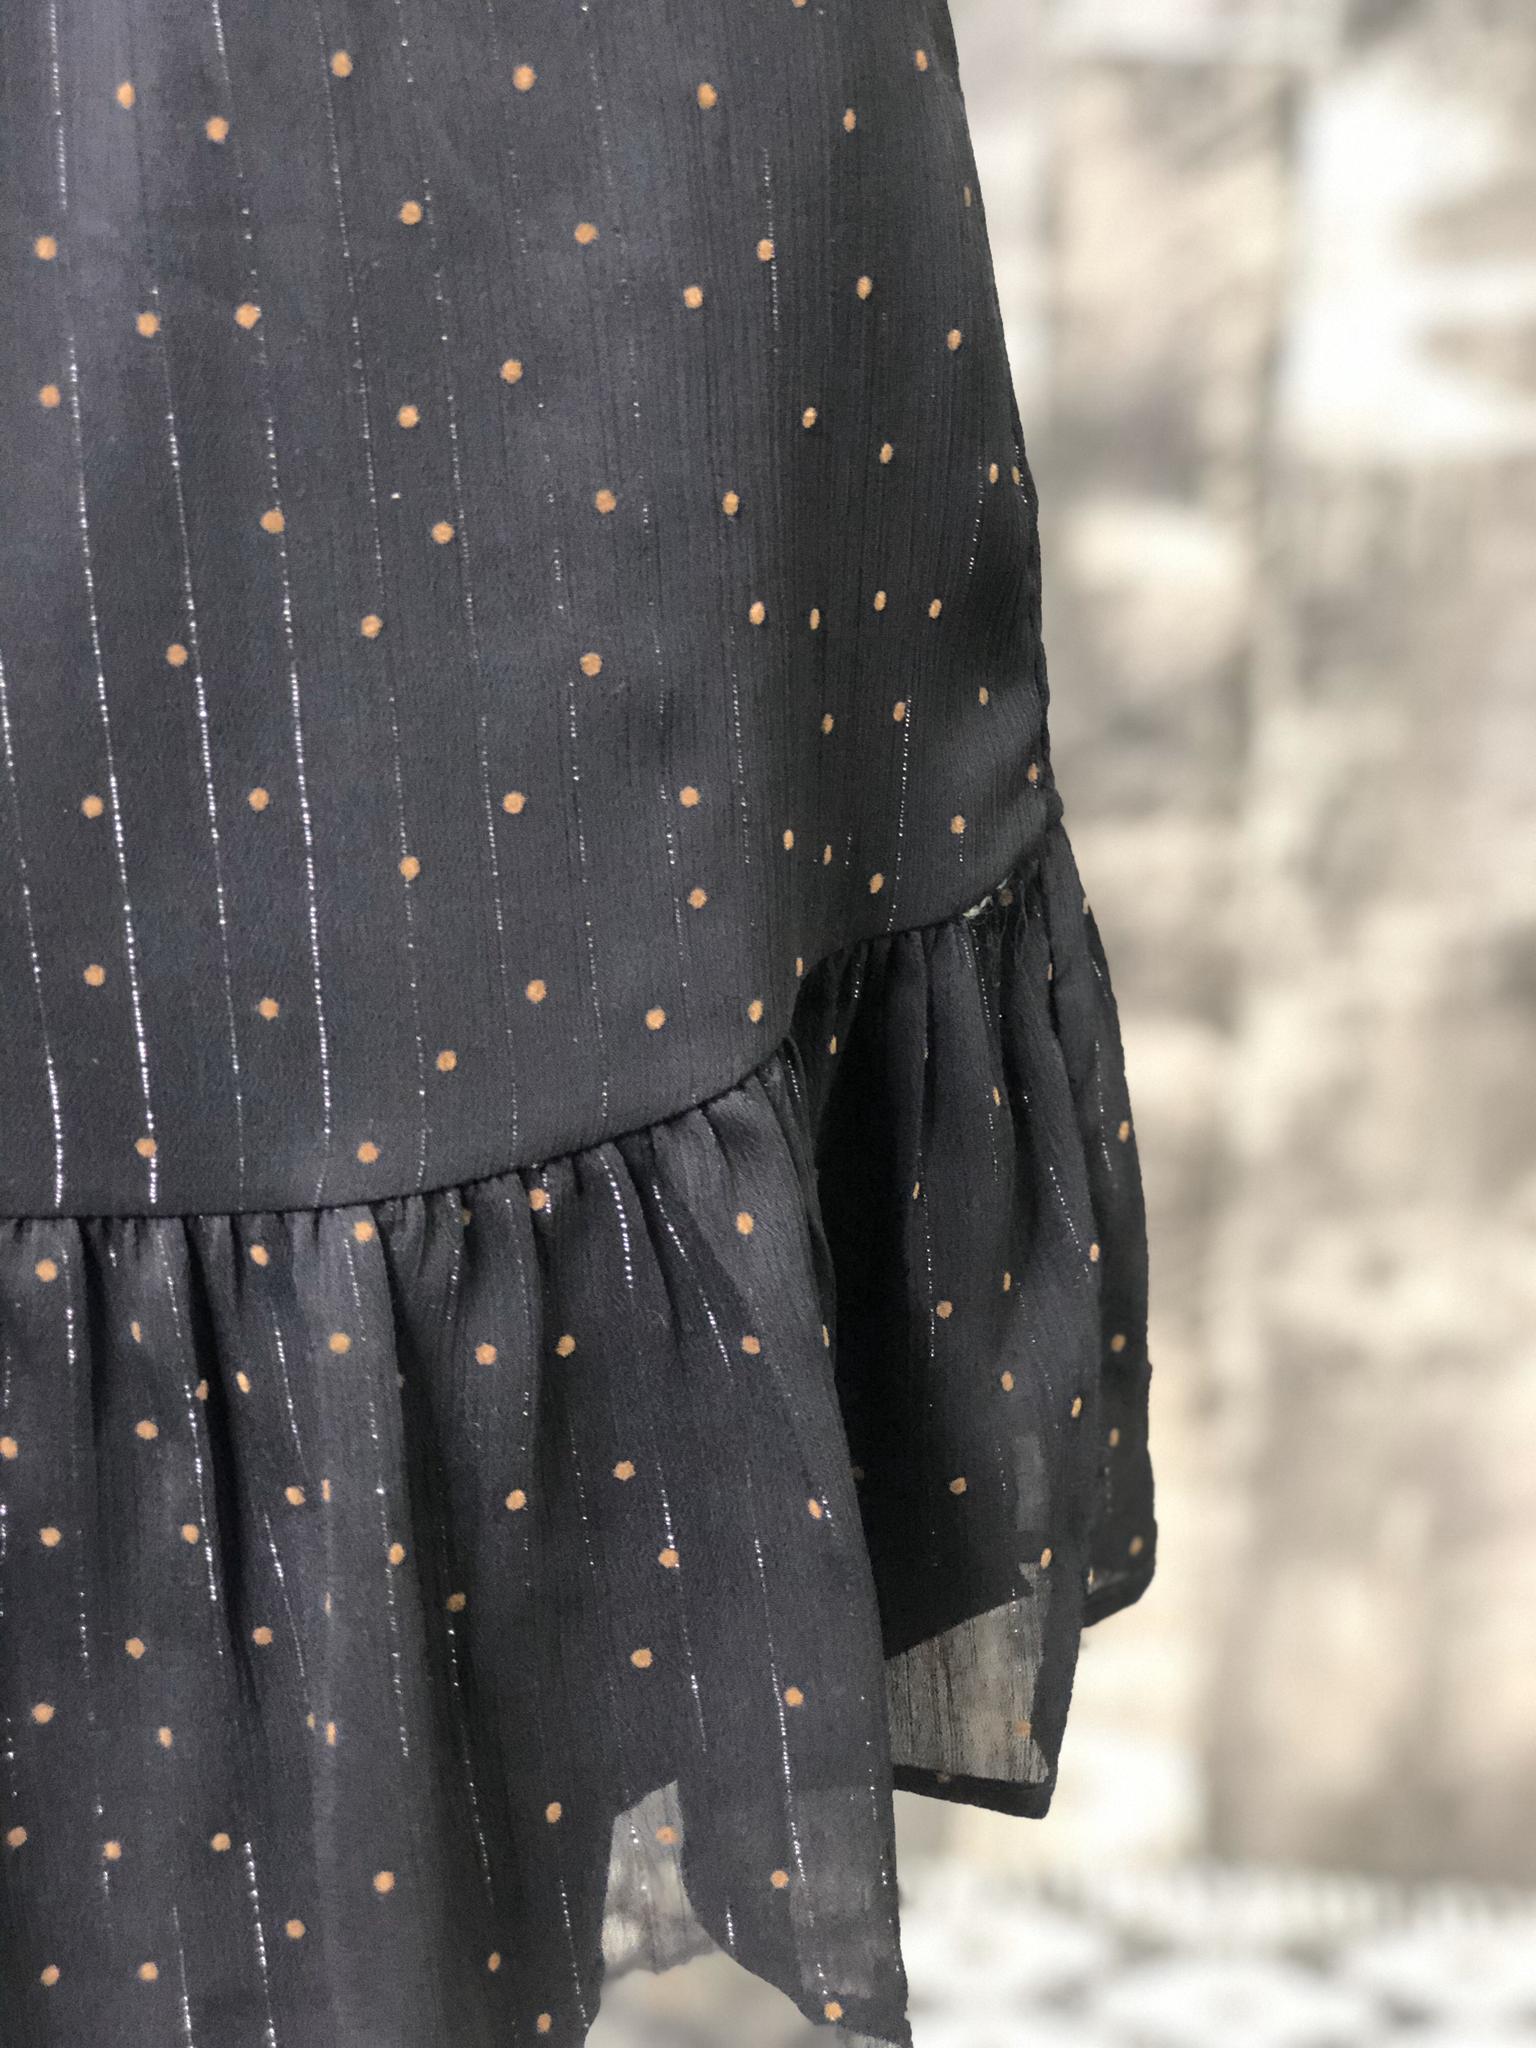 Black Polka Dotted Holiday Dress